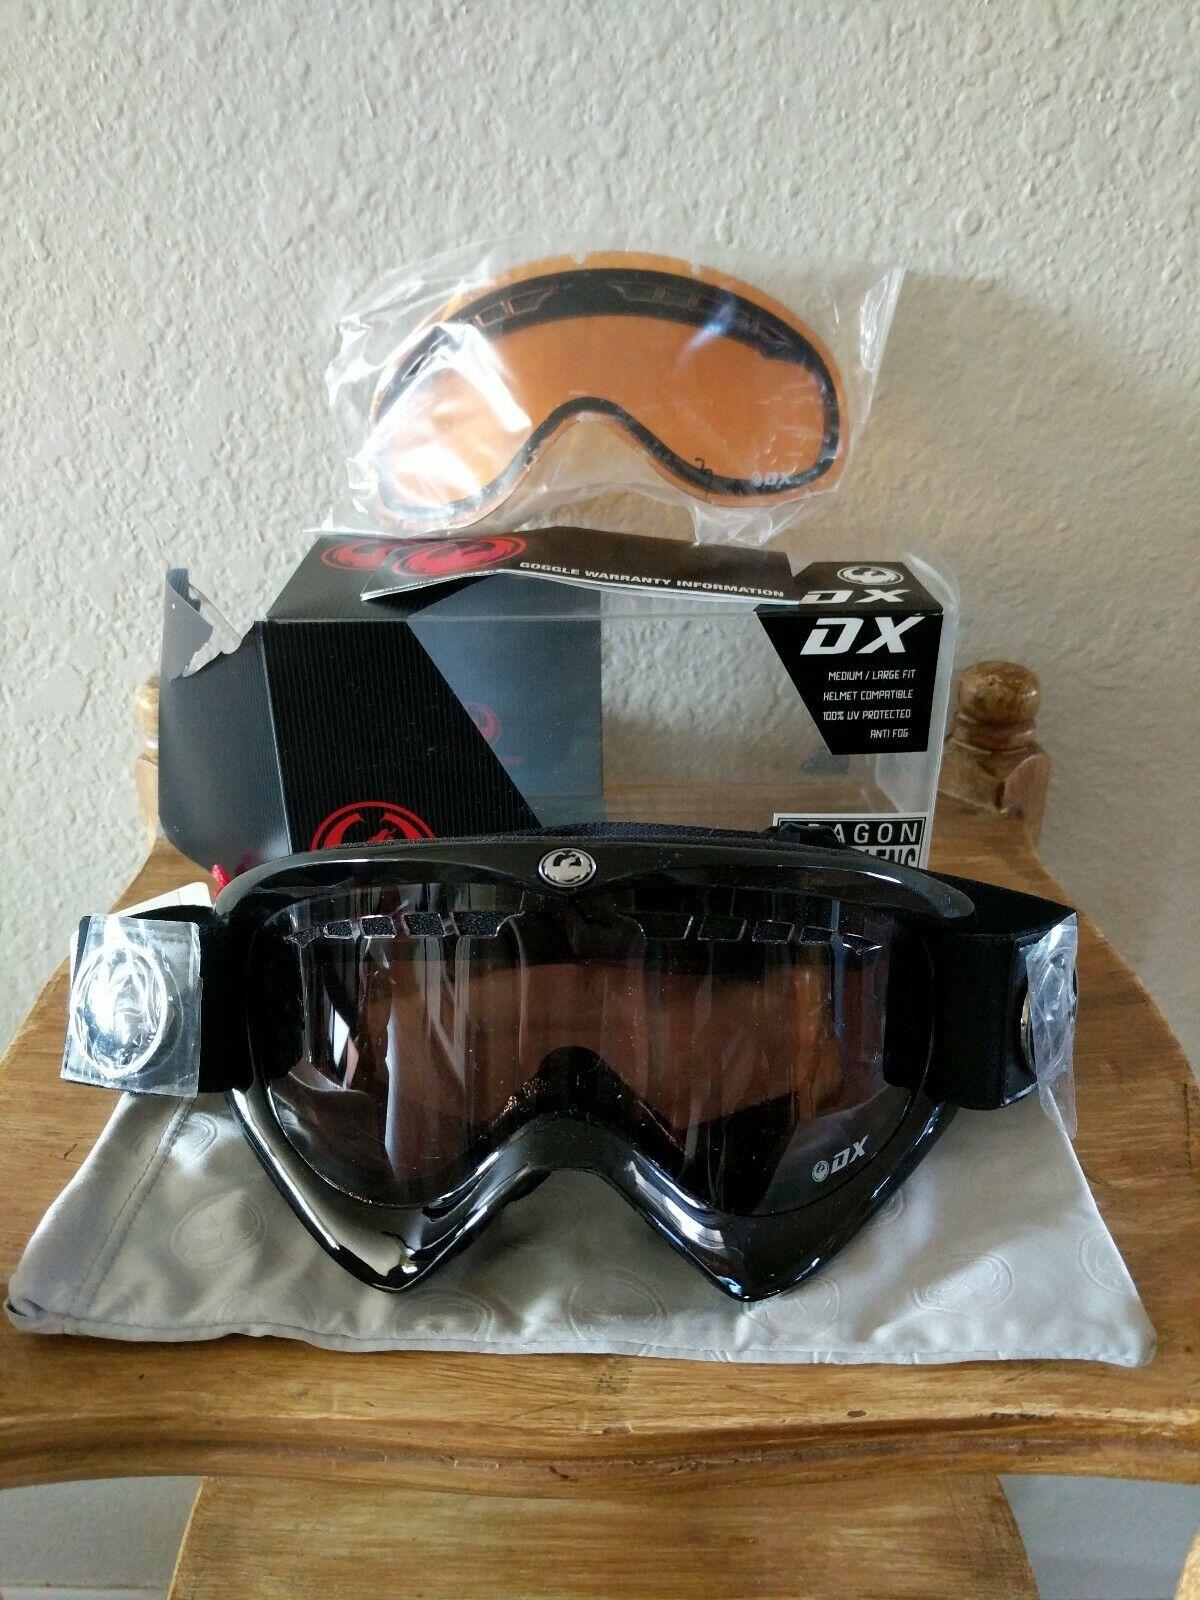 NEW HTF Smith DX Goggles Jet Stealth Jet Polar w Amb RL Medium Large Fit 100% UV